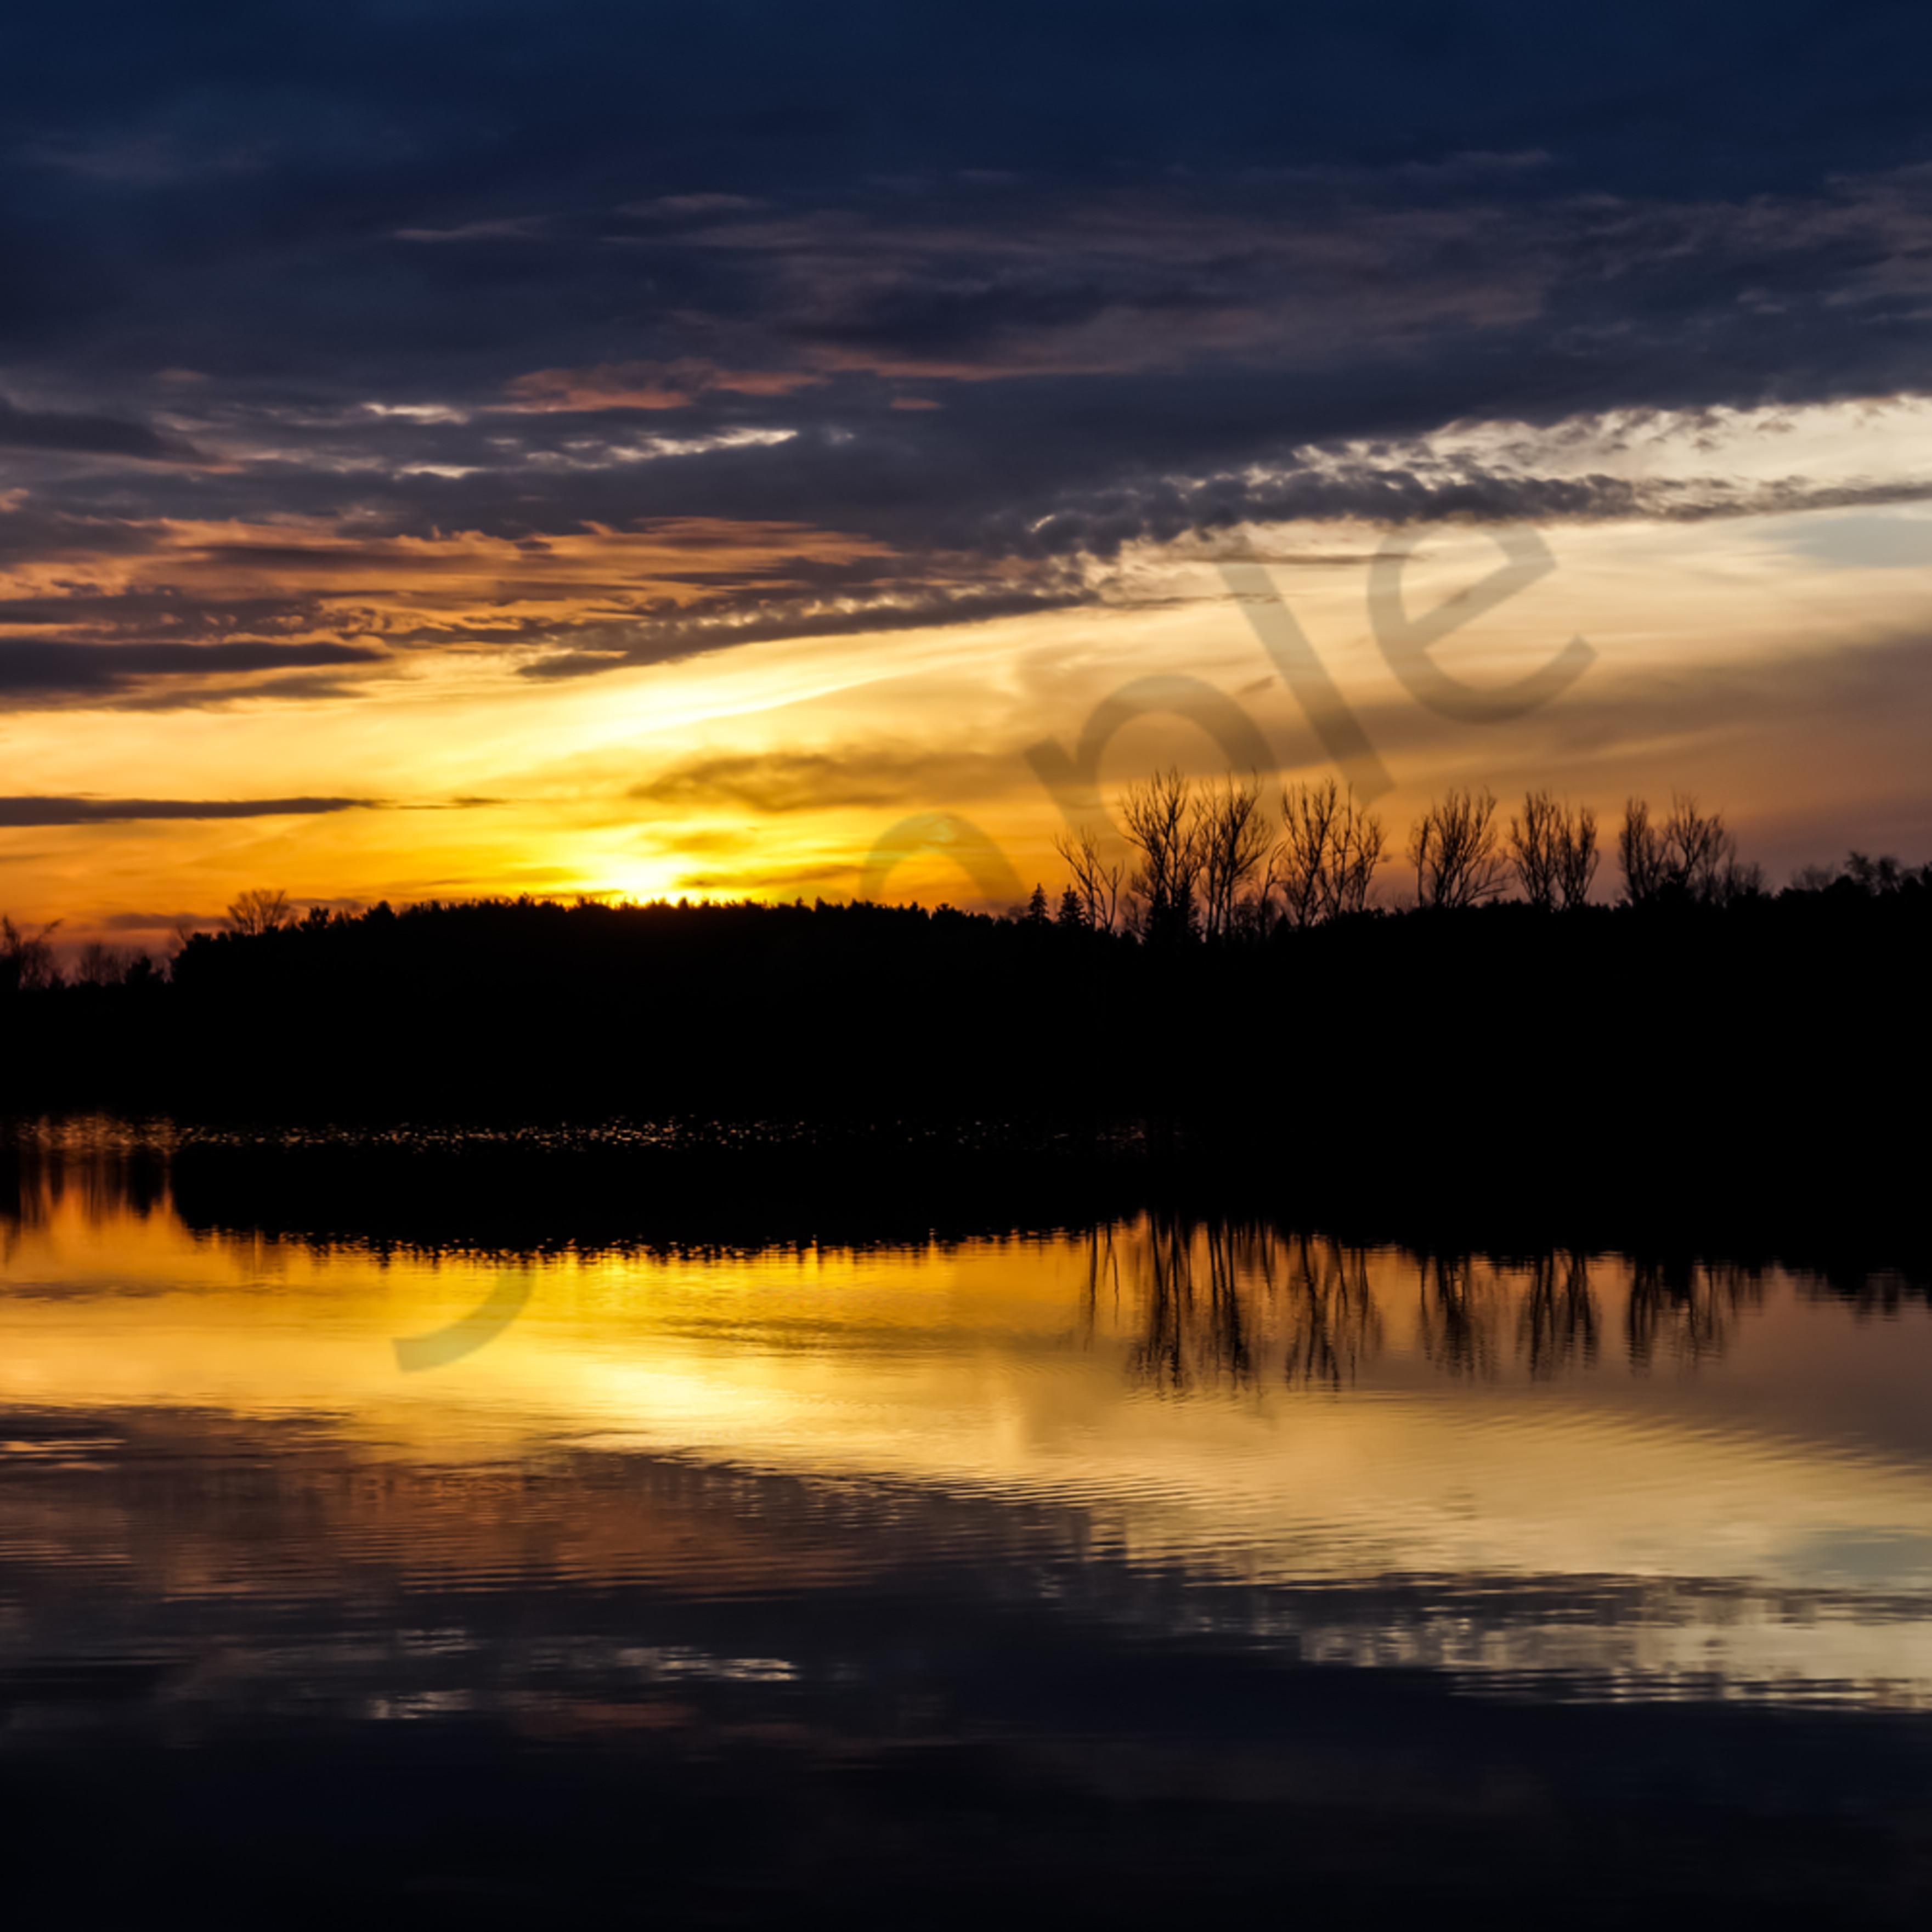 The lake at dusk yc6eid